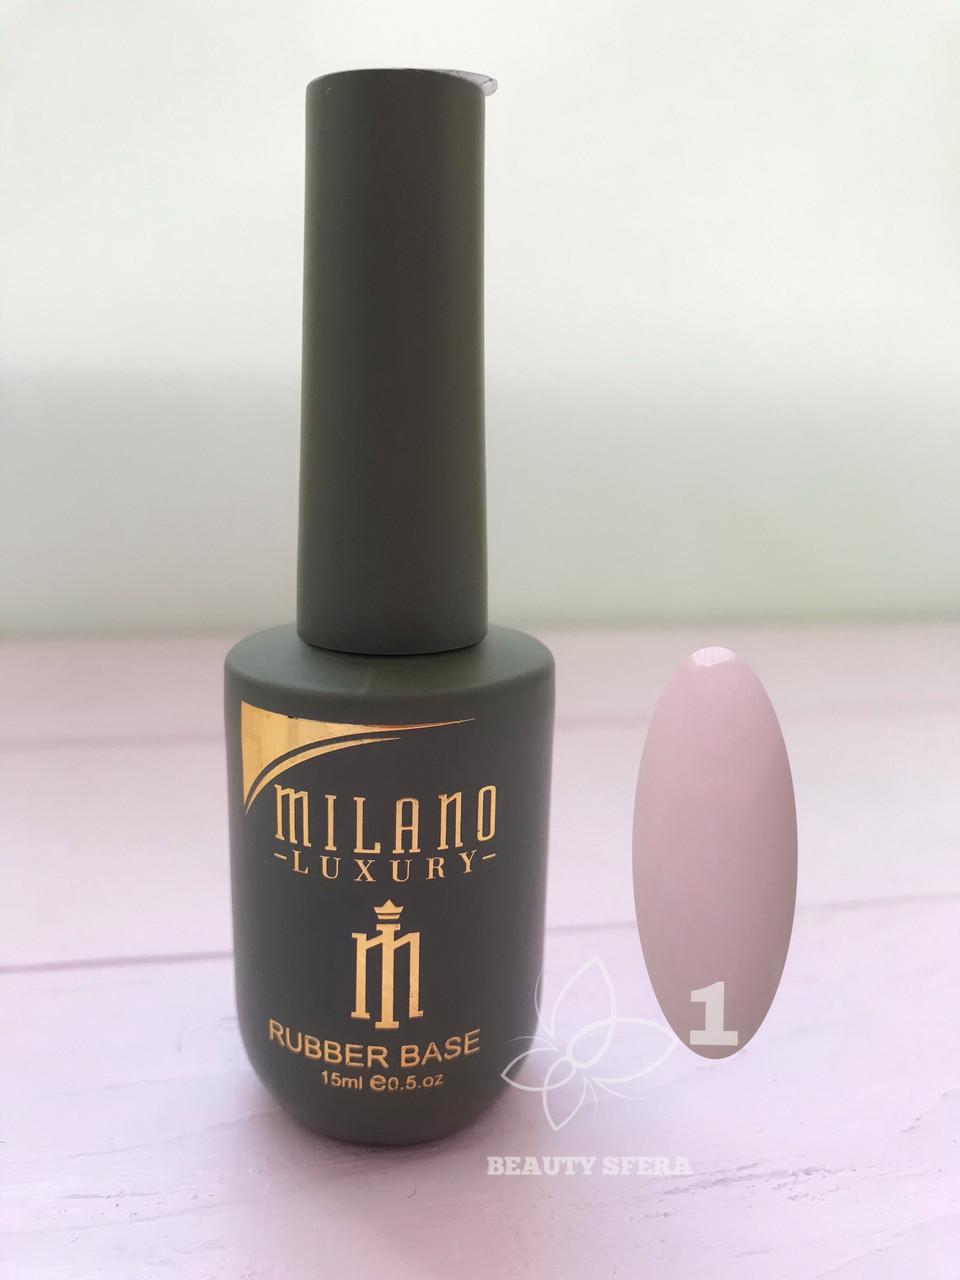 Cover Base Milano Luxury №1 15ml